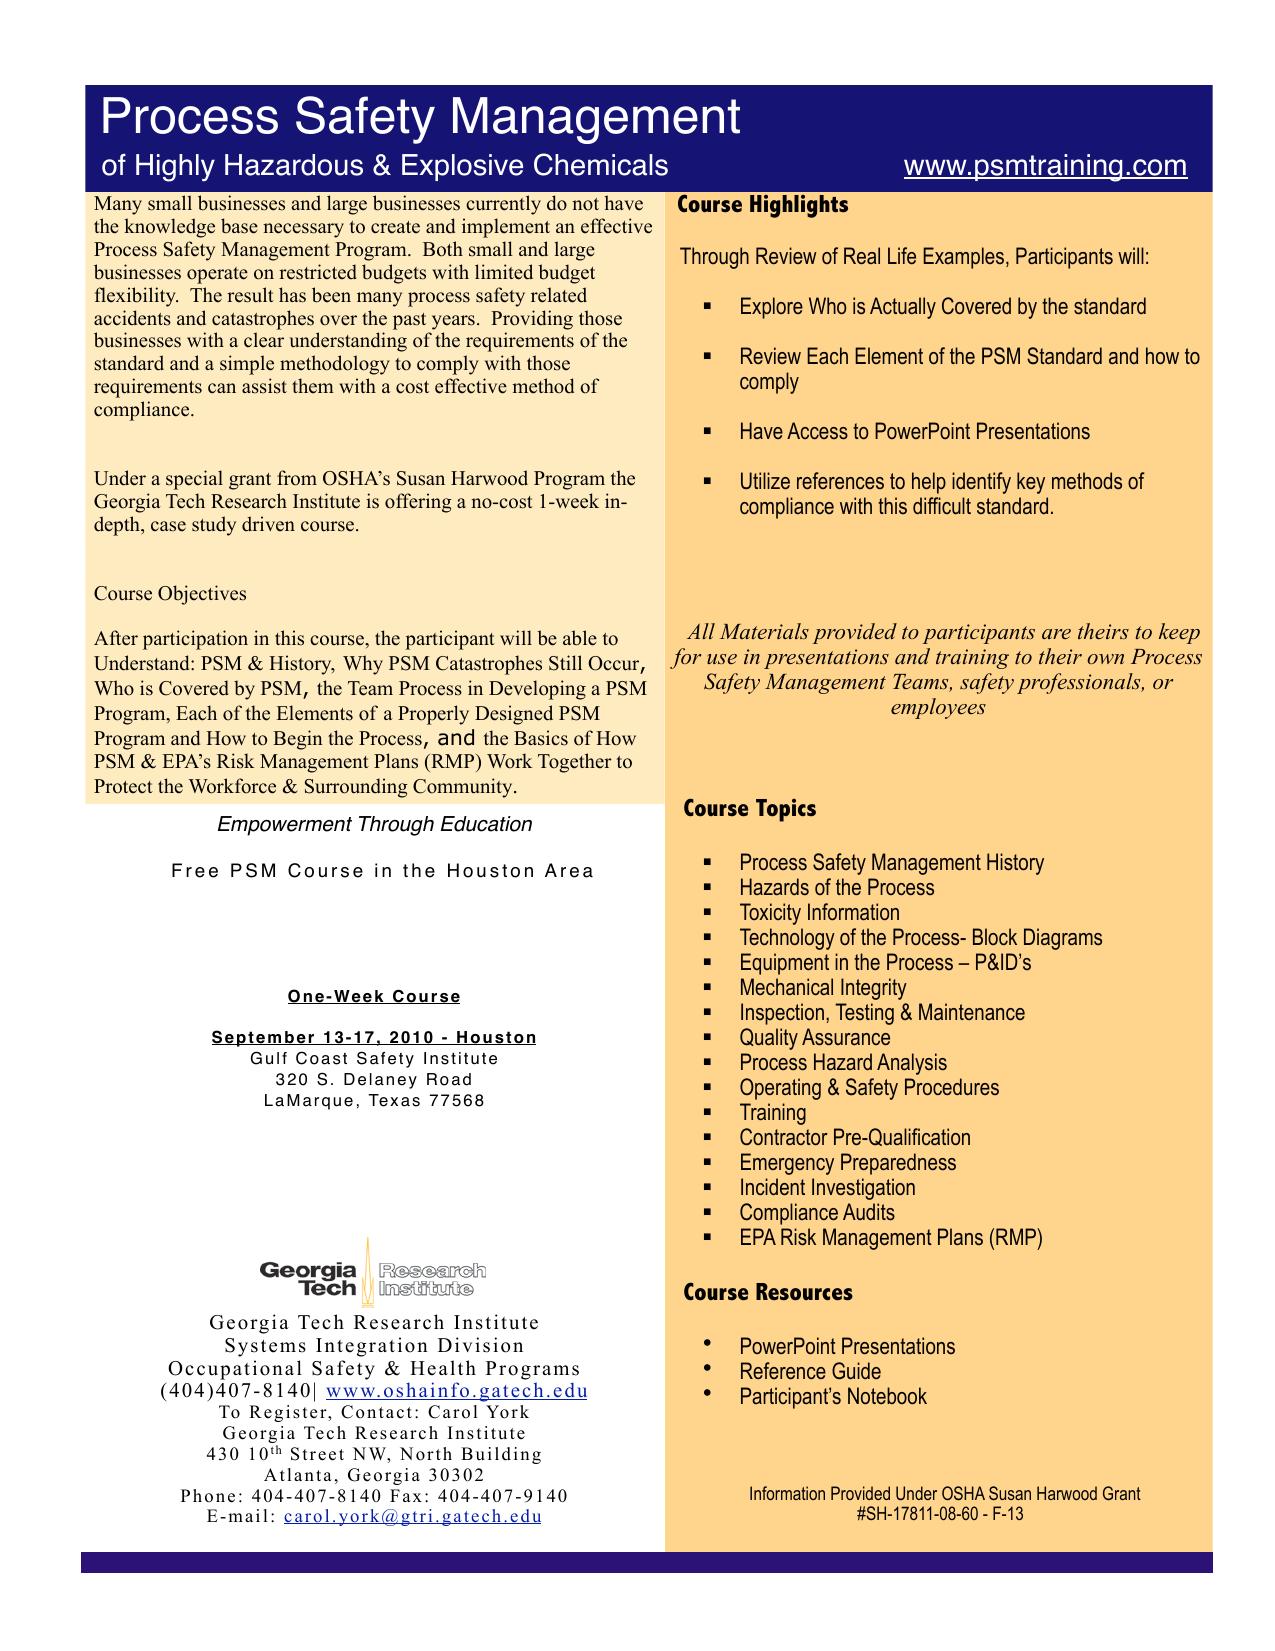 PSM One Day Flyer v3 3 Houston - process safety management